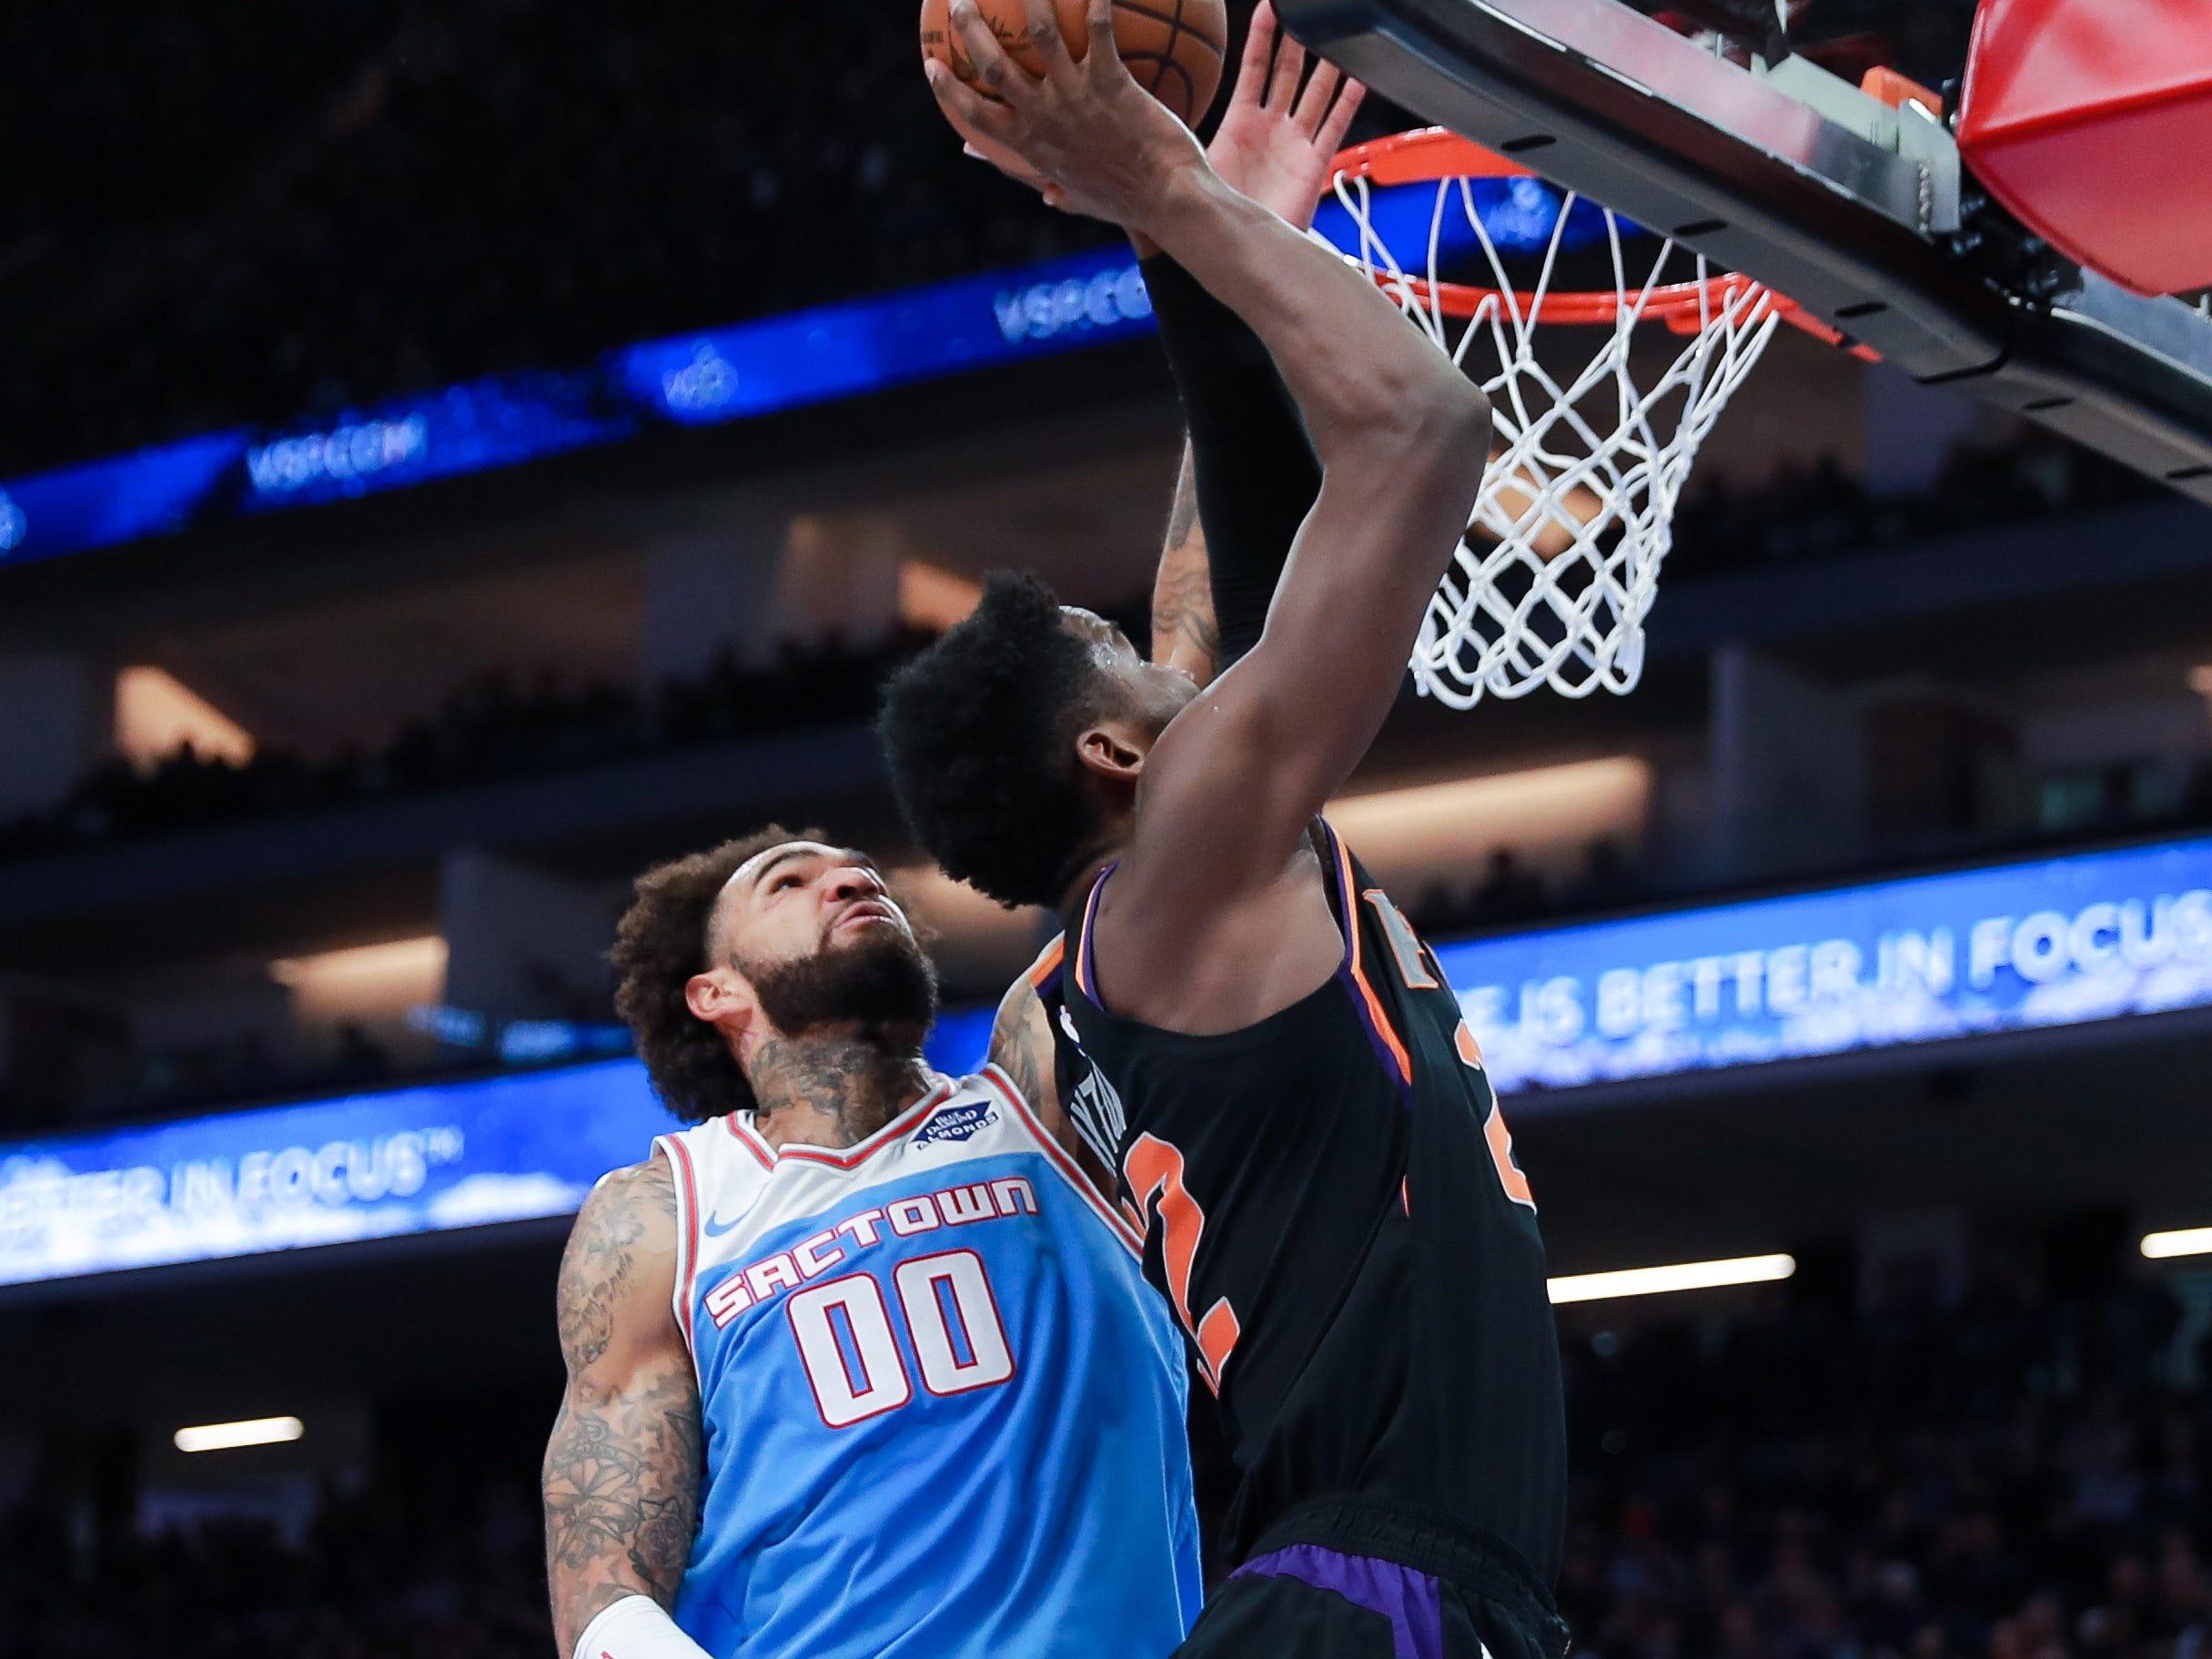 Feb 10, 2019; Sacramento, CA, USA; Sacramento Kings center Willie Cauley-Stein (00) blocks a shot by Phoenix Suns center Deandre Ayton (22) during the second quarter at Golden 1 Center.